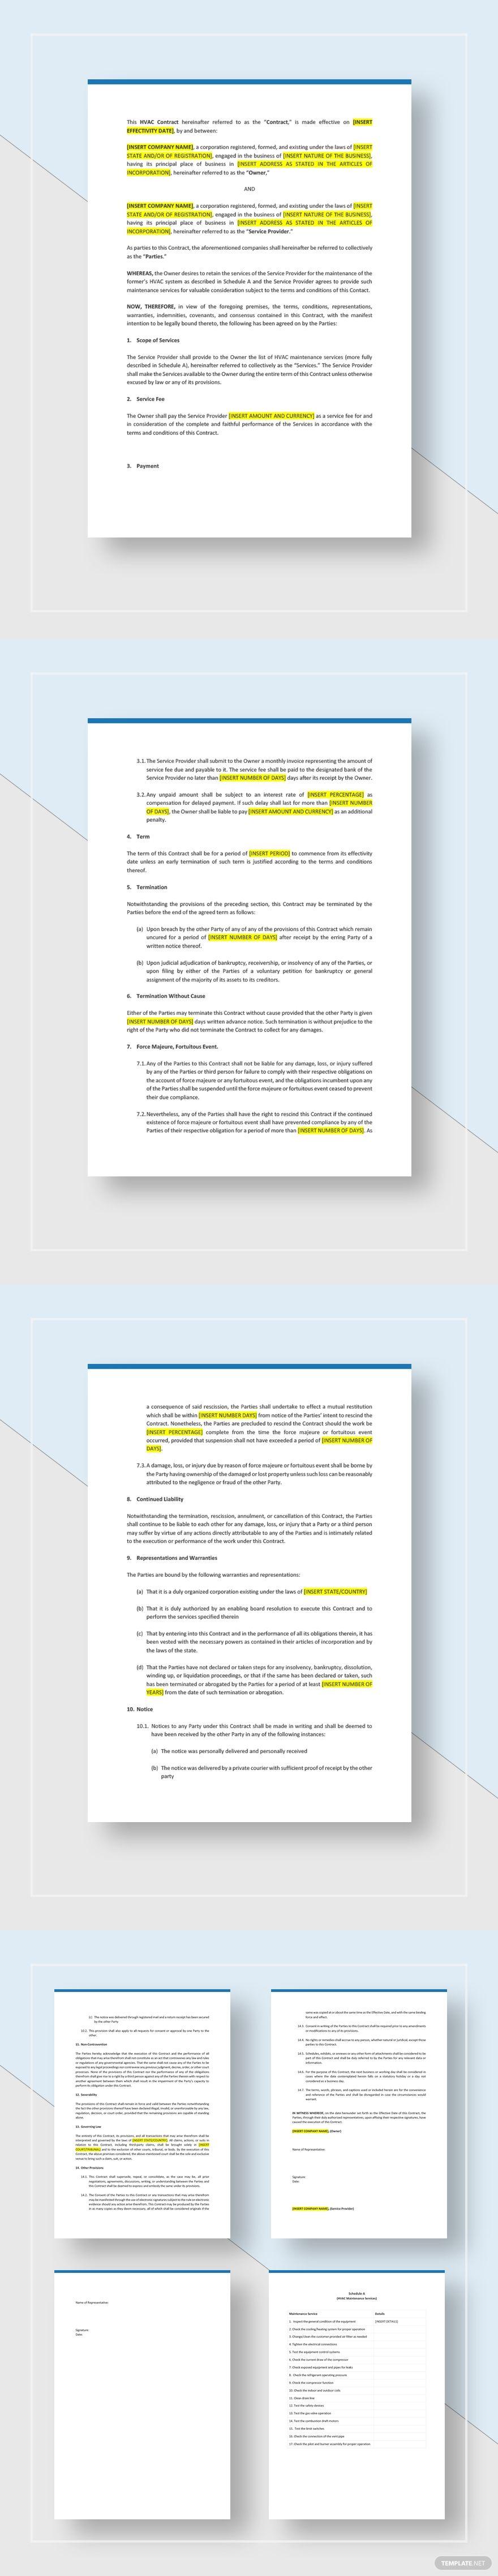 Hvac Service Contract Template Word Doc Google Docs Apple Mac Pages Hvac Services Contract Template Hvac Maintenance